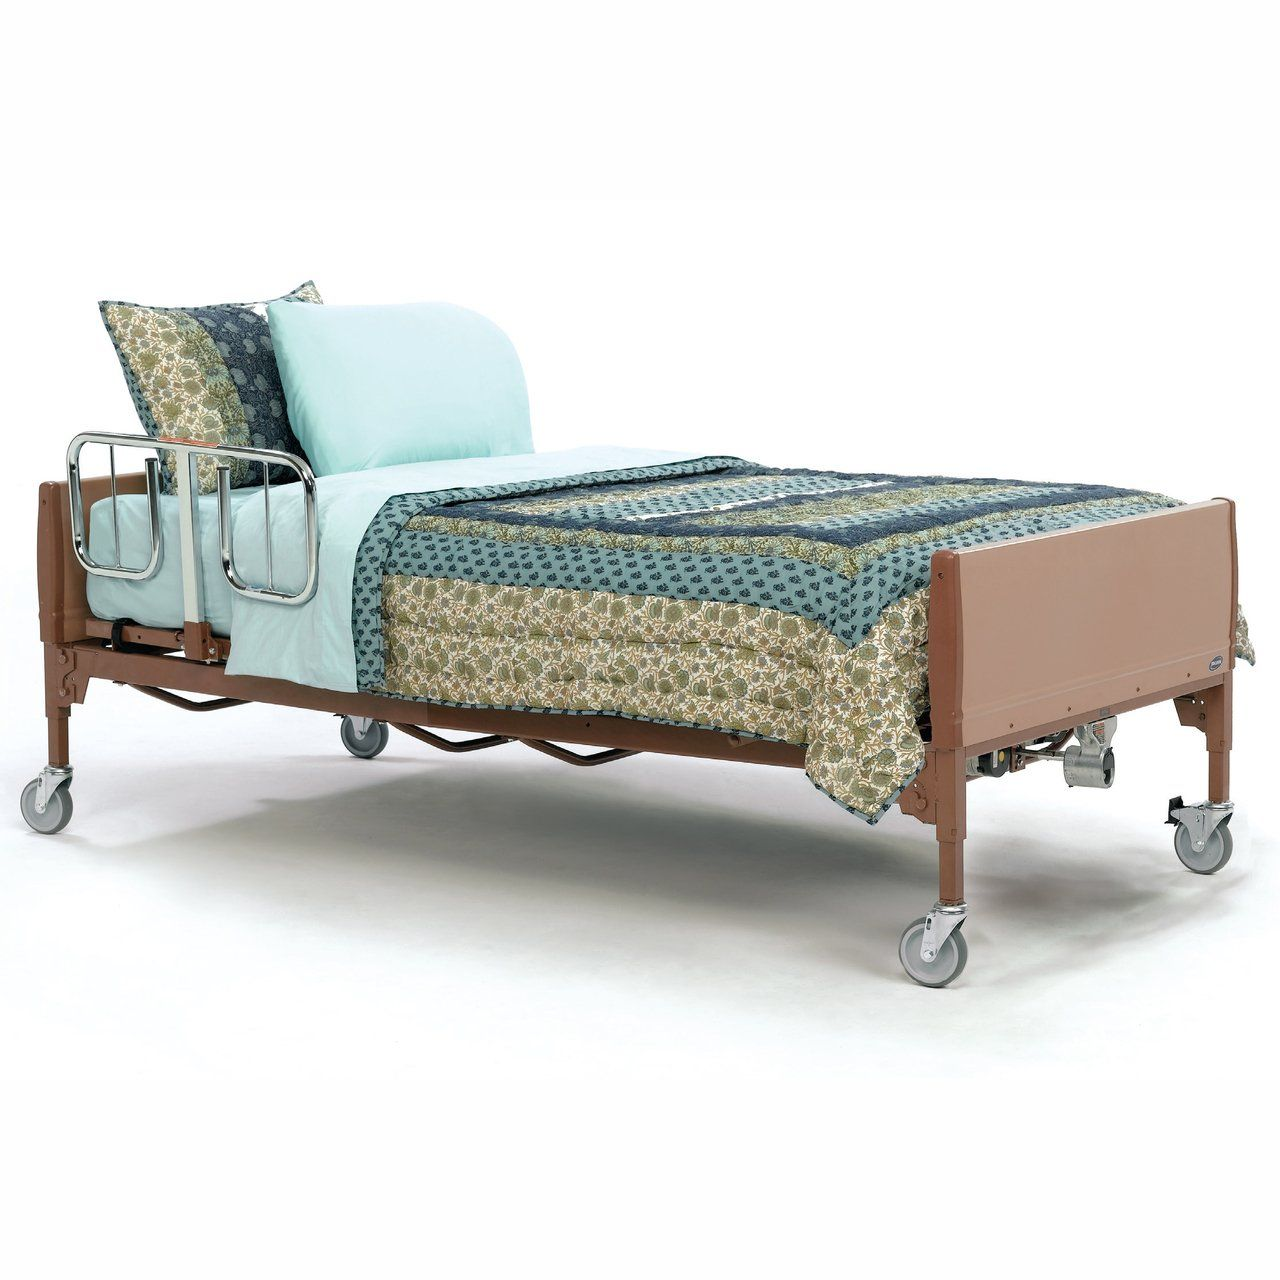 Invacare 600 Heavy Duty Hospital Bed BAR600IVC